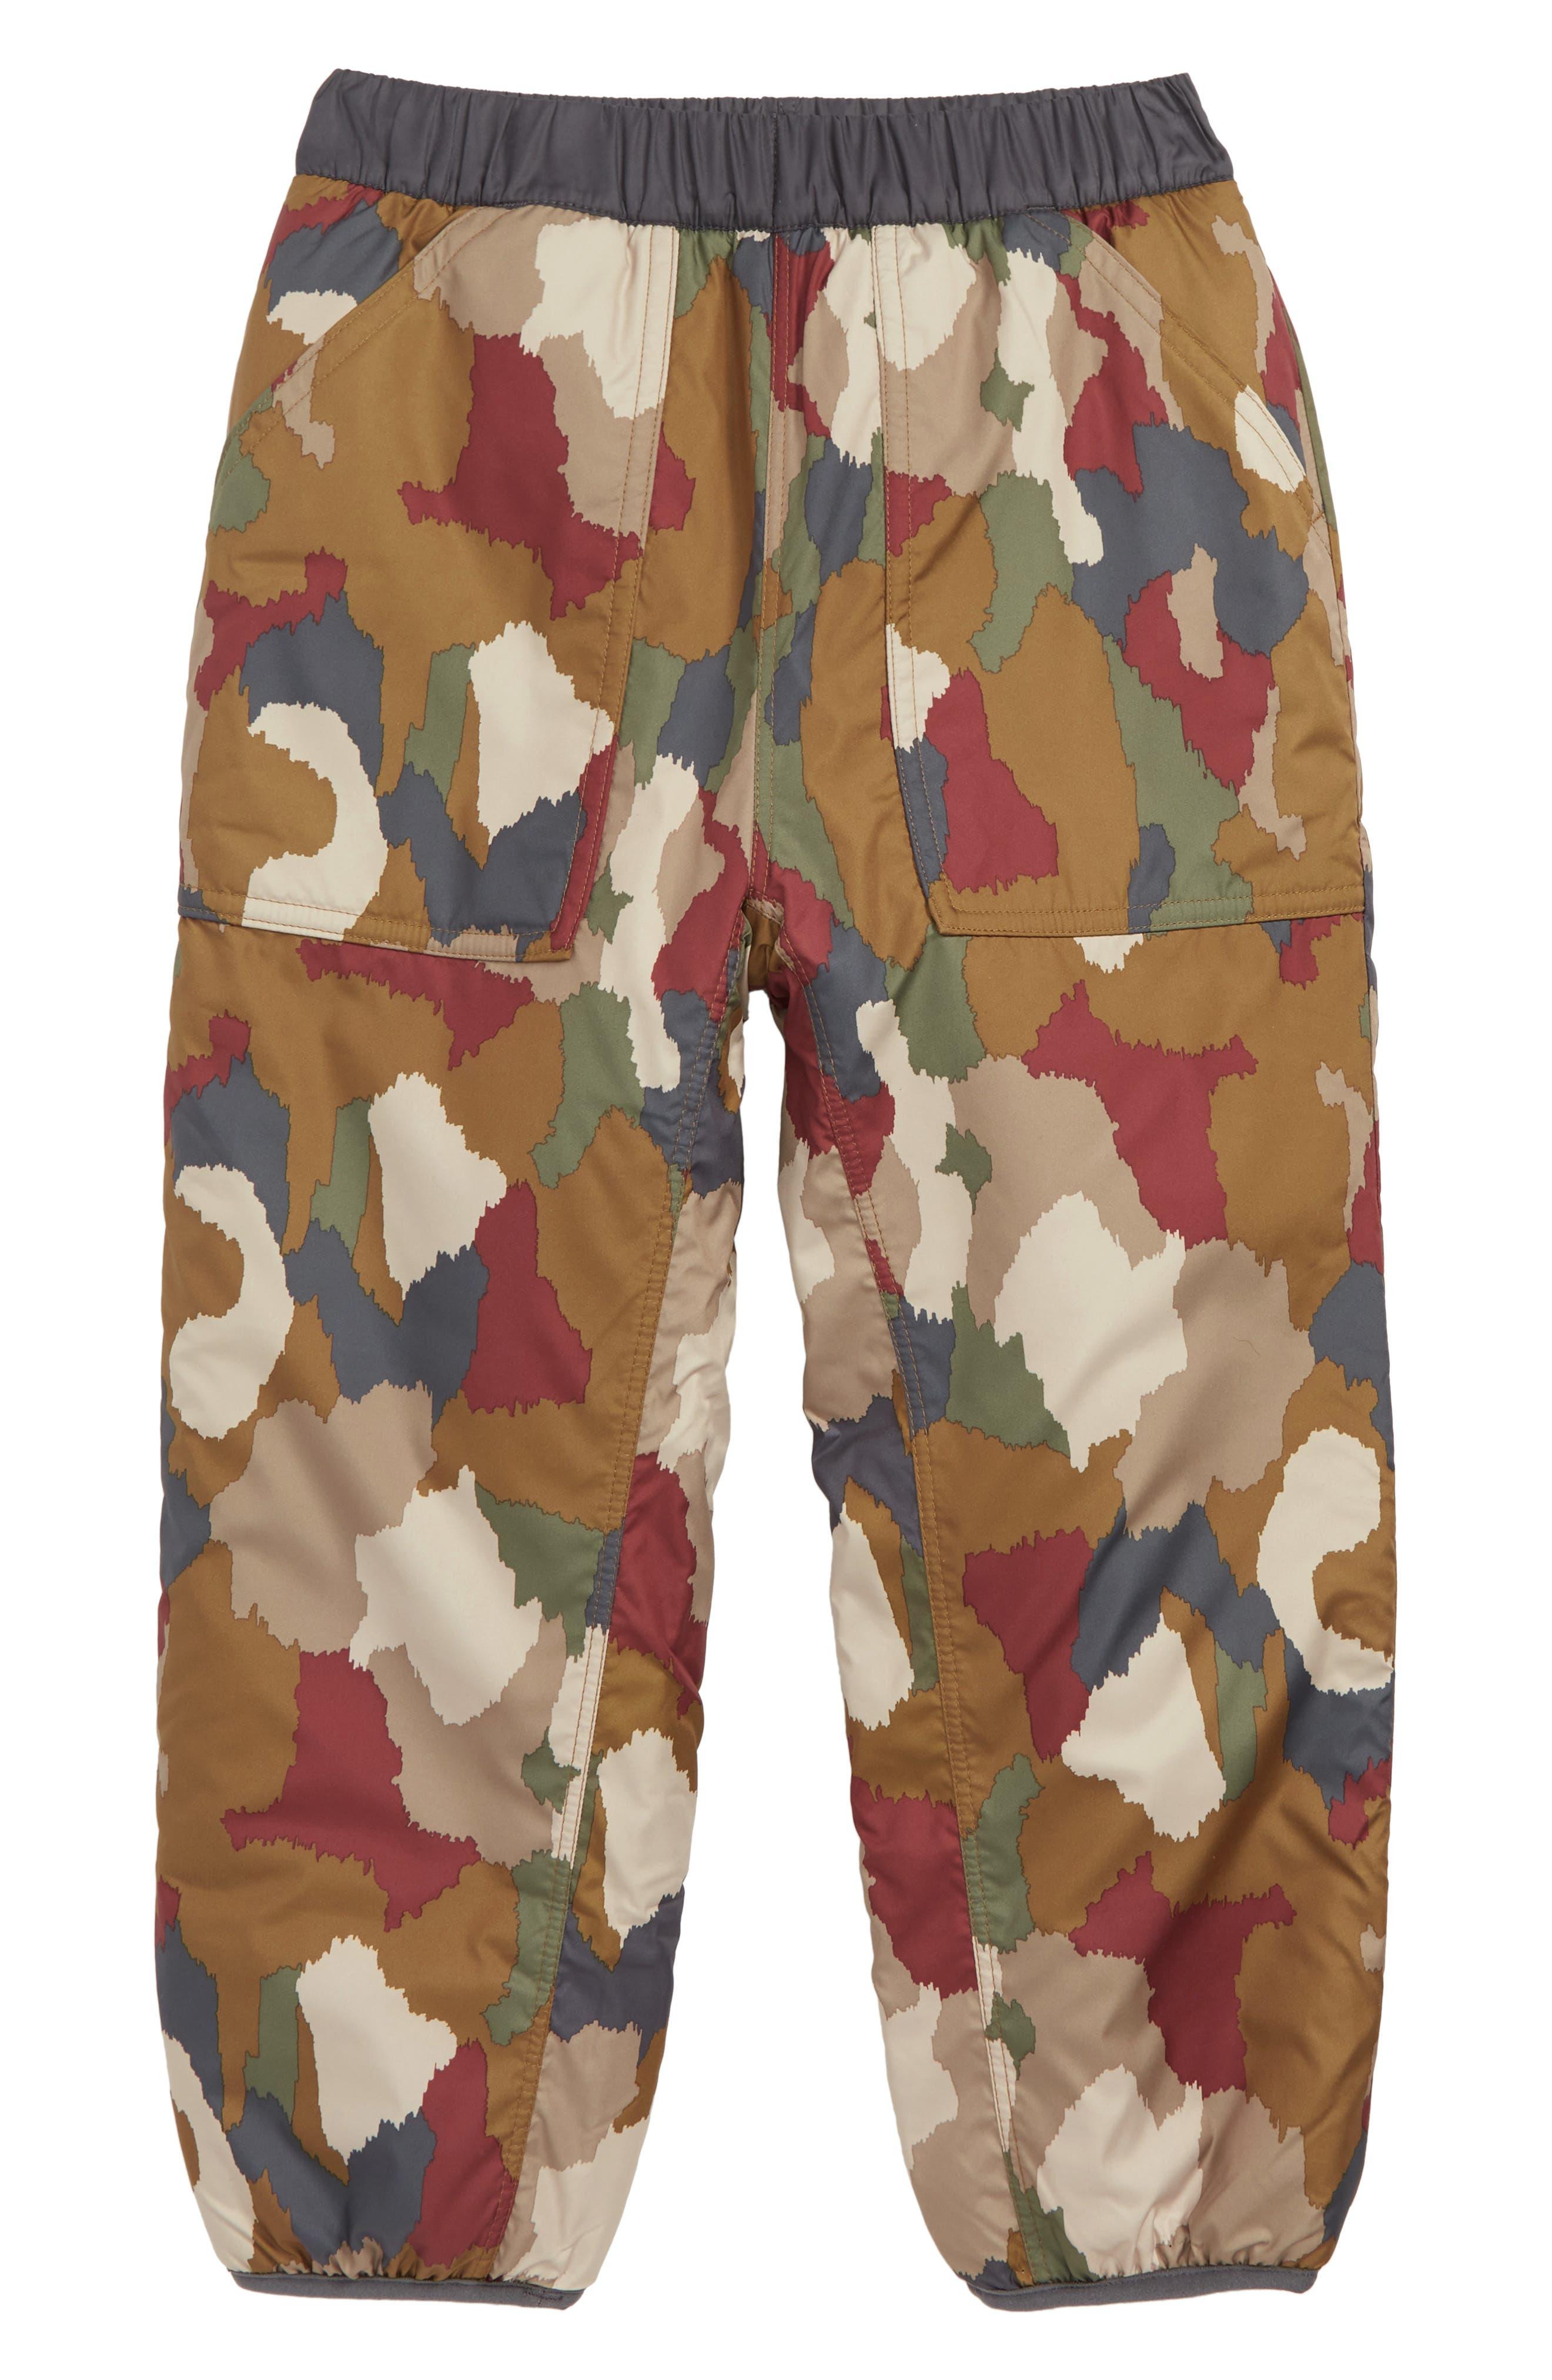 Tribbles Reversible Water Repellent Snow Pants,                             Main thumbnail 1, color,                             BCEL BUNKER CAMO: EL CAP KHAKI